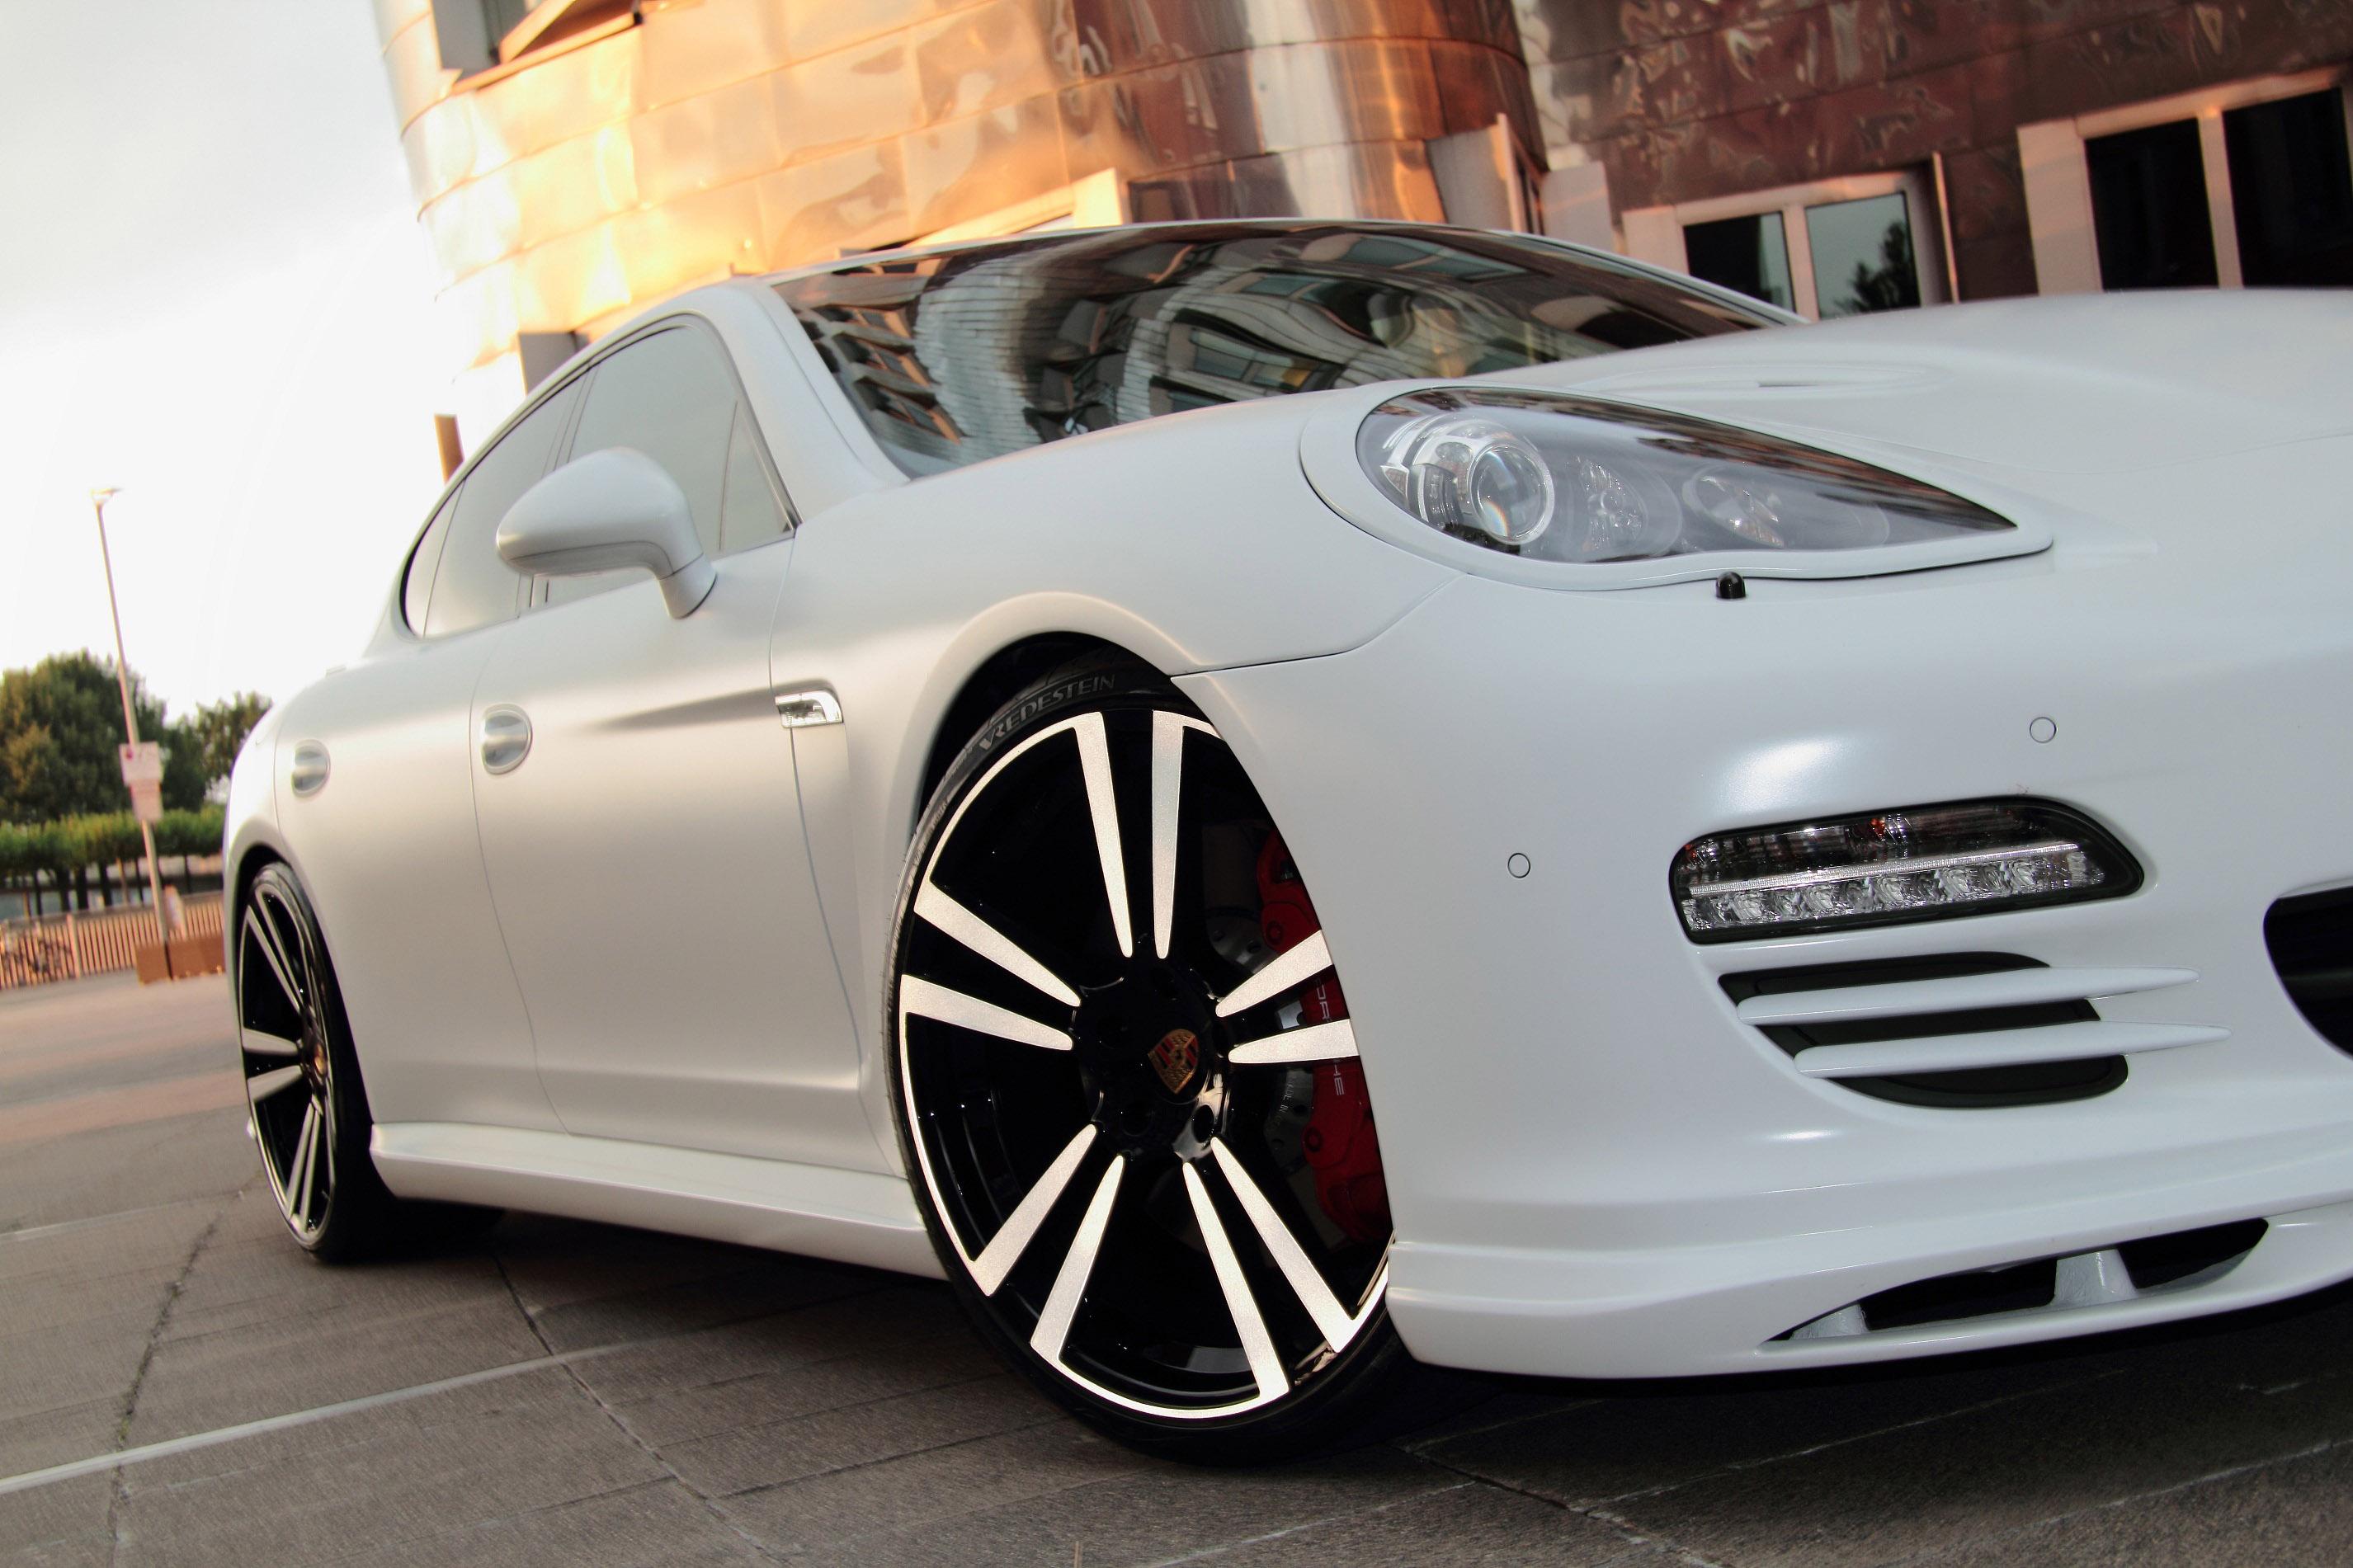 anderson germany porsche panamera gts white storm edition - Porsche Panamera White Red Interior